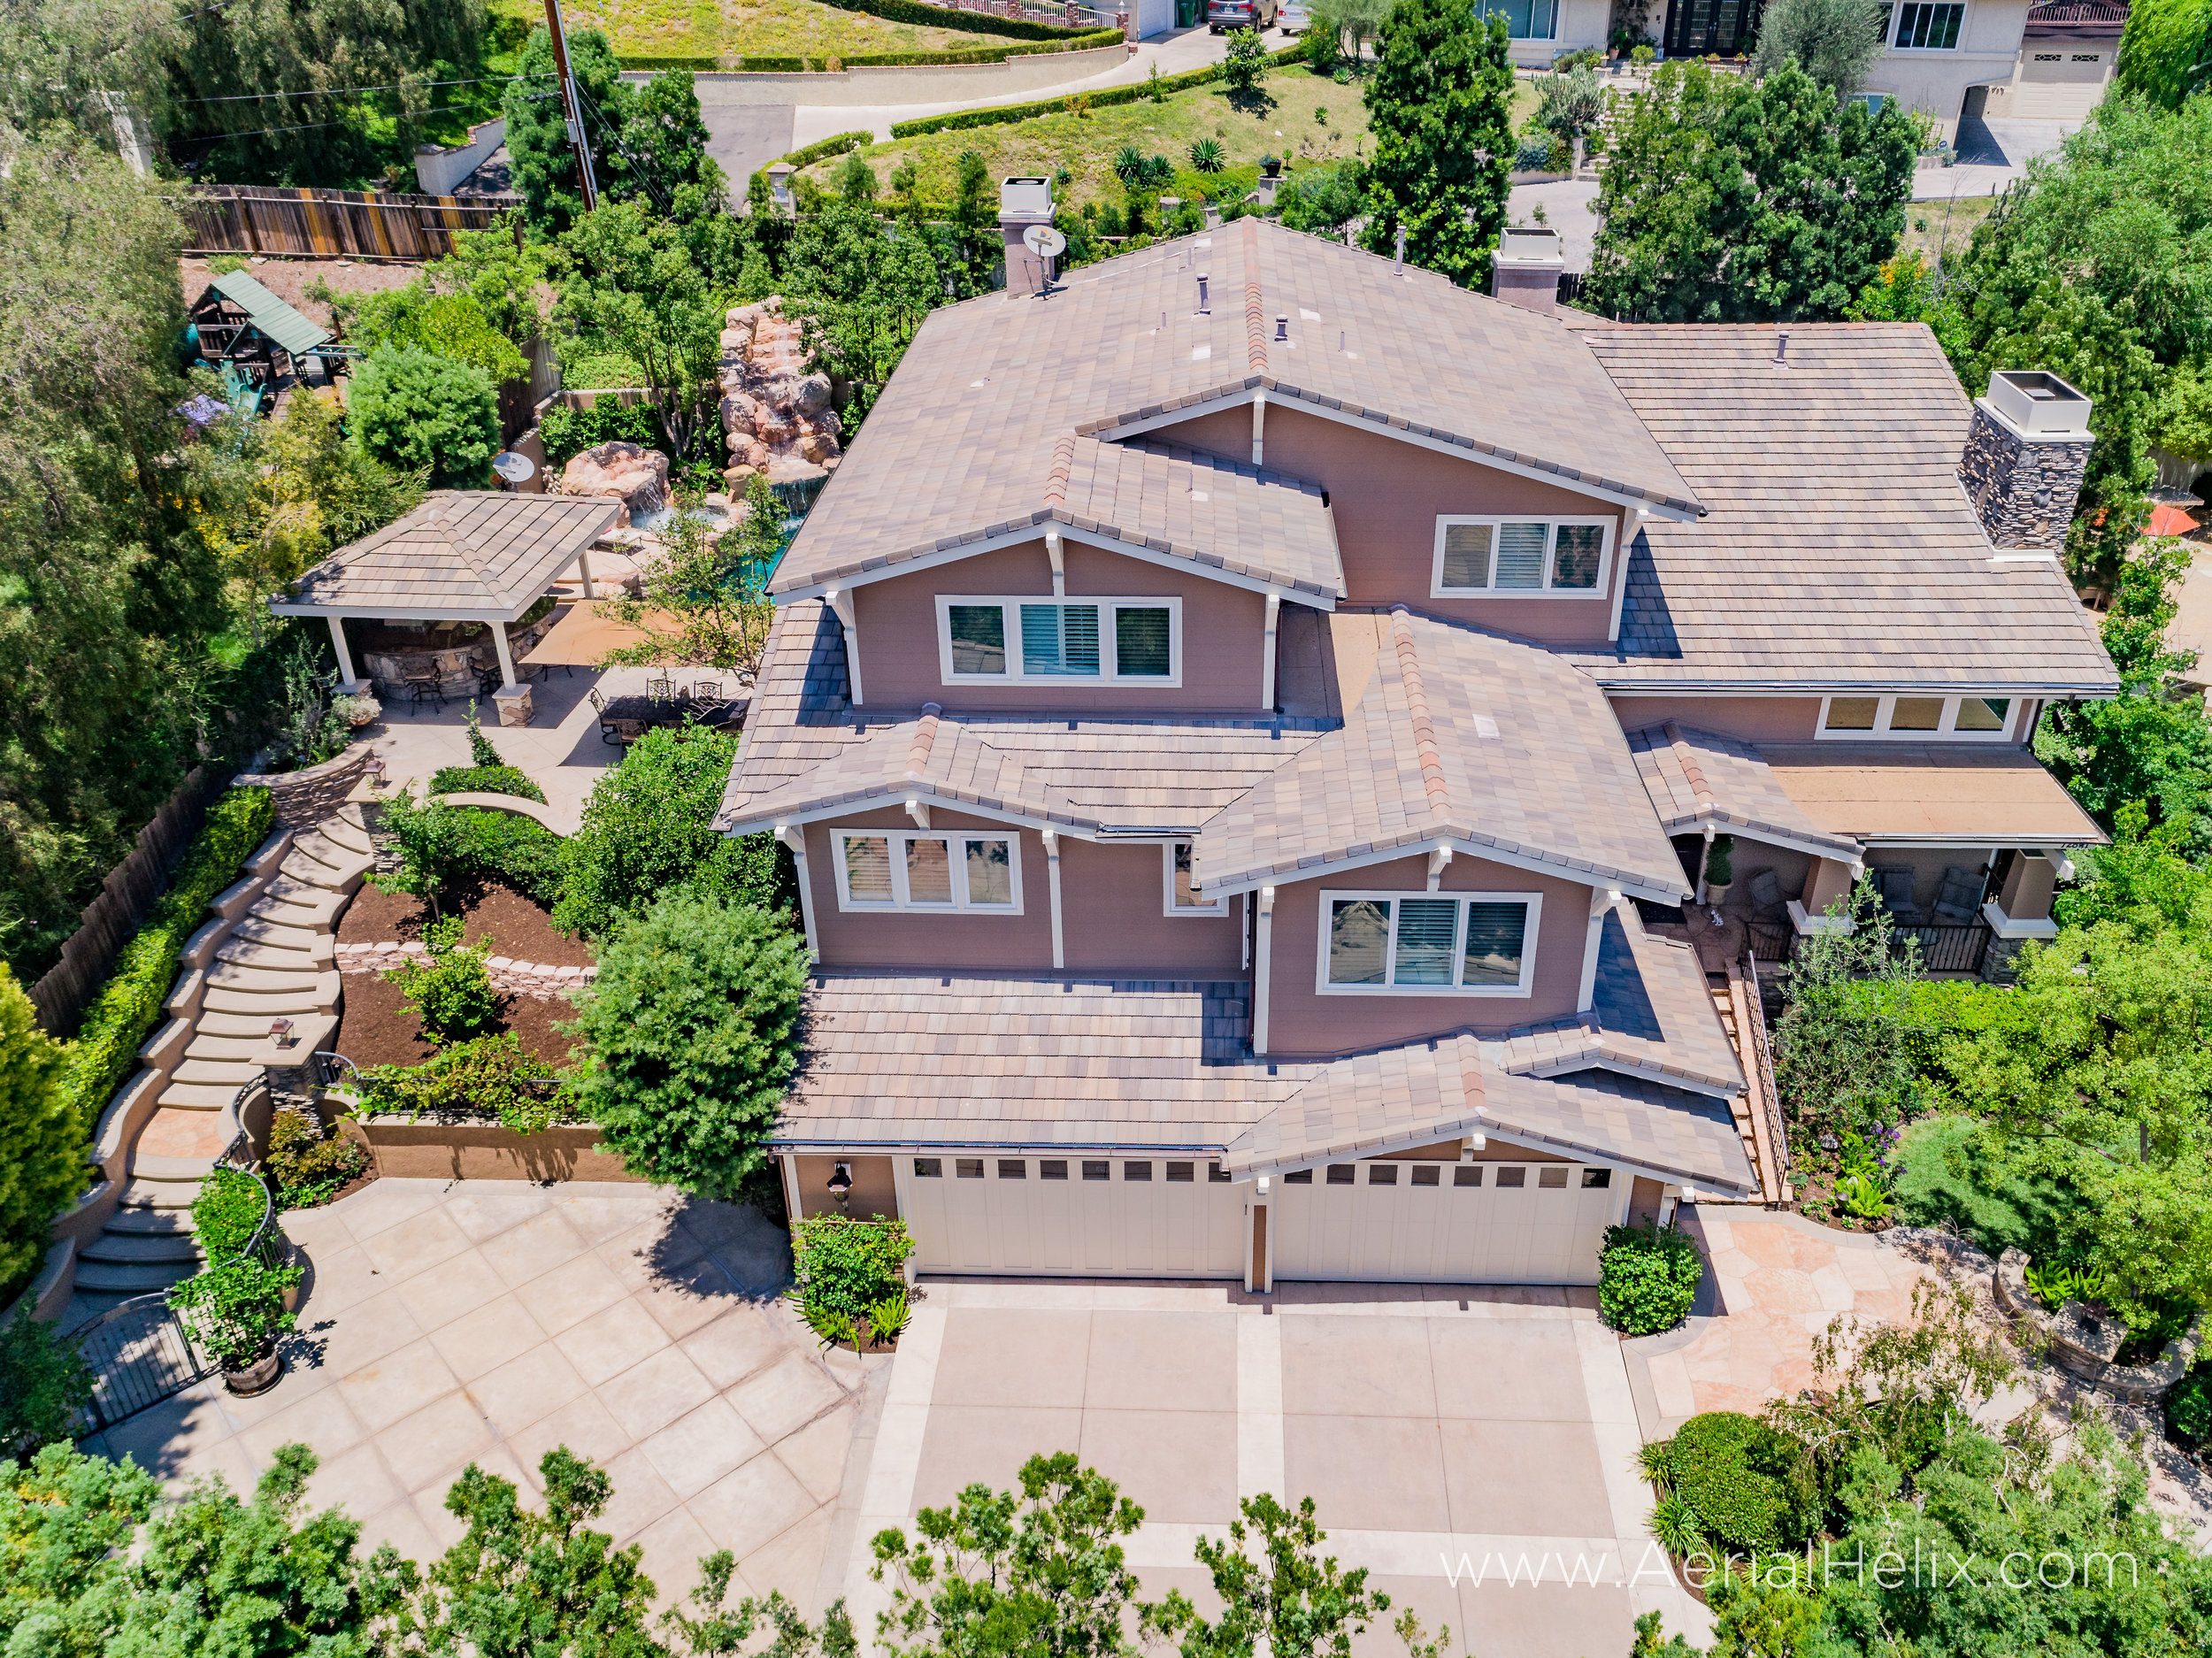 HELIX - Craftsman Lane - Real Estate Drone Photographer-3.jpg